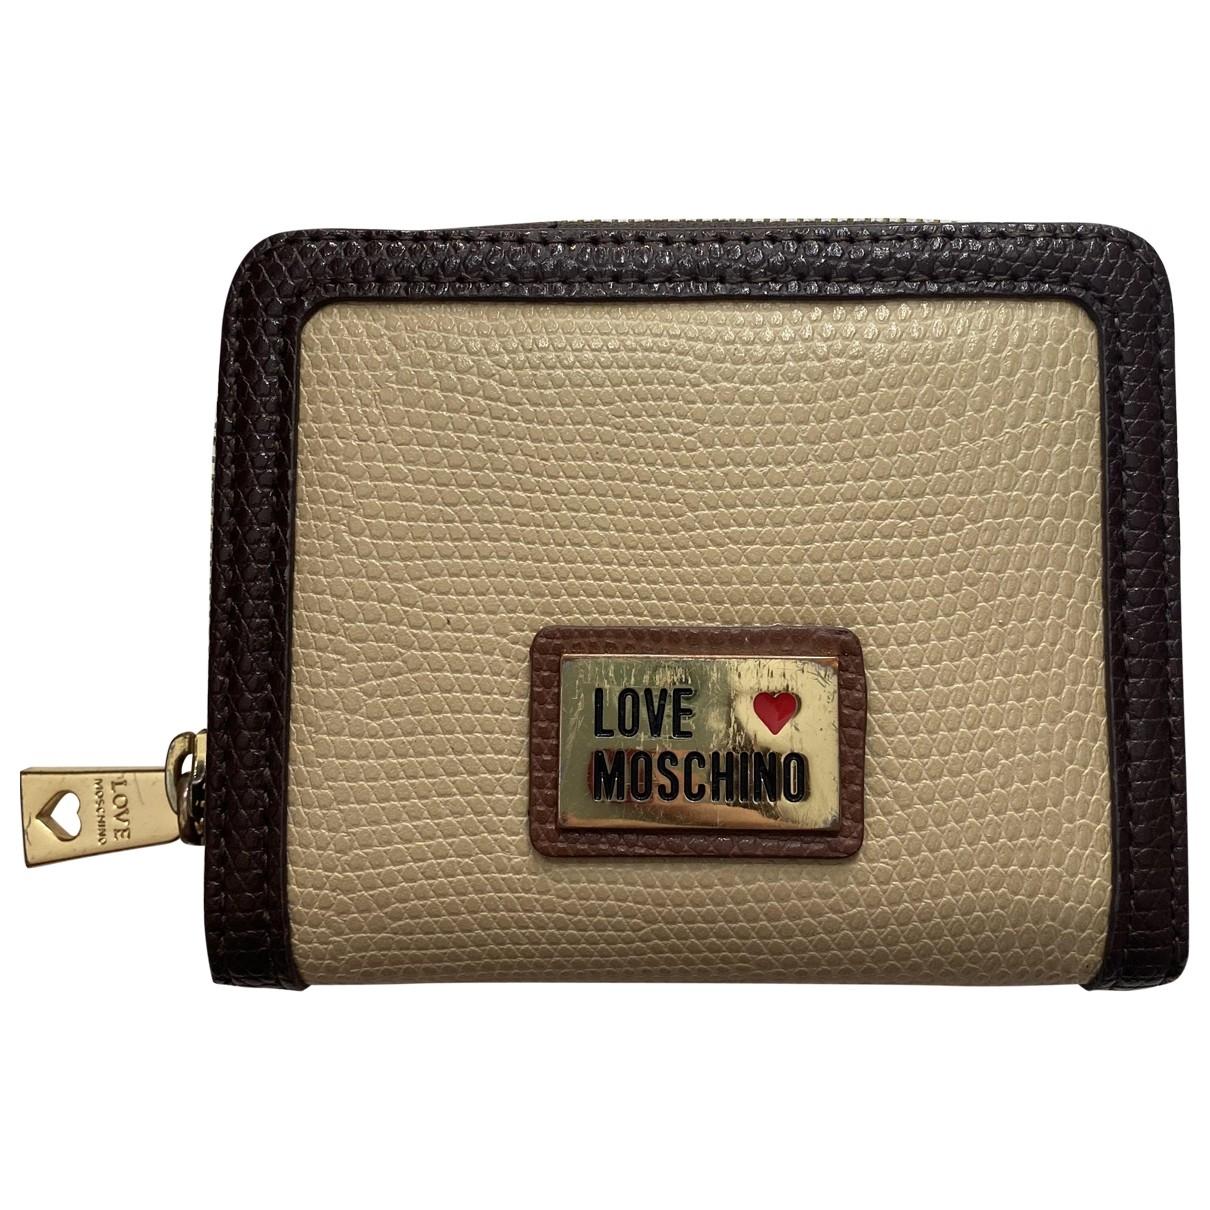 Moschino Love - Petite maroquinerie   pour femme en cuir - beige